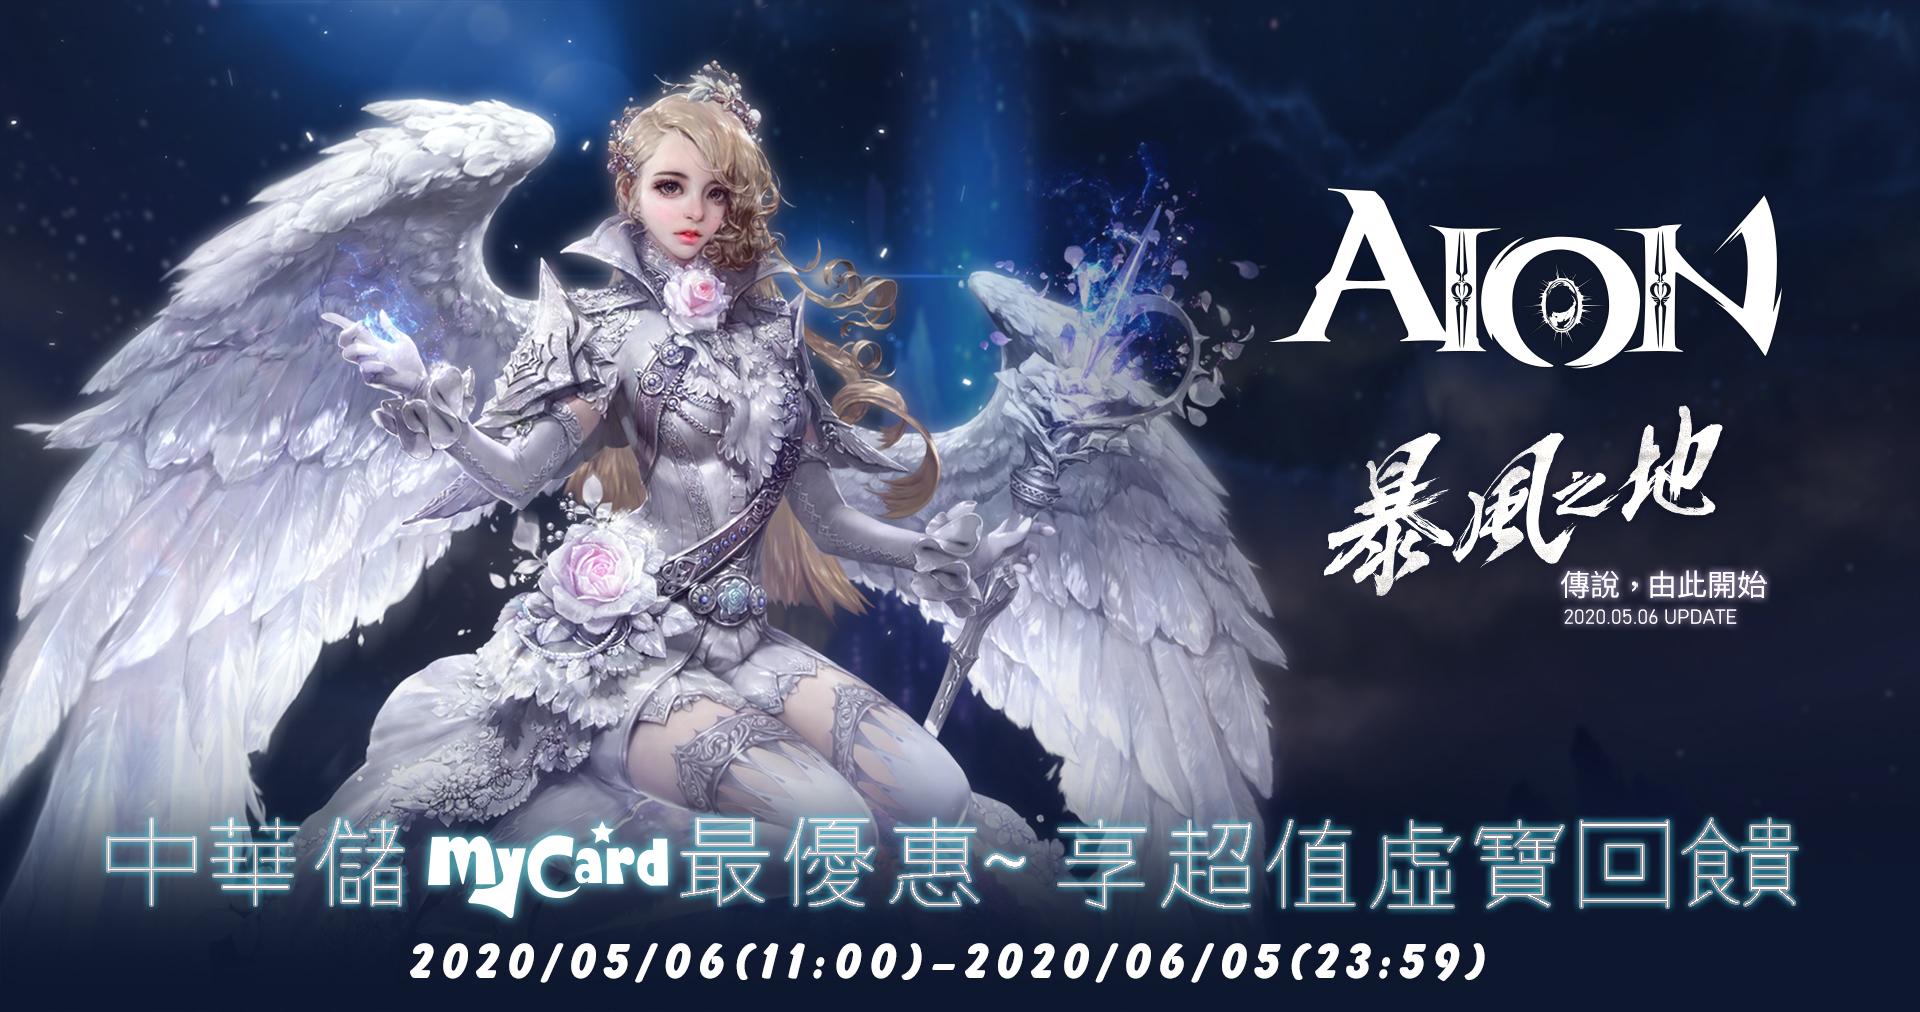 《AION》MyCard儲值享超值虛寶禮    中華